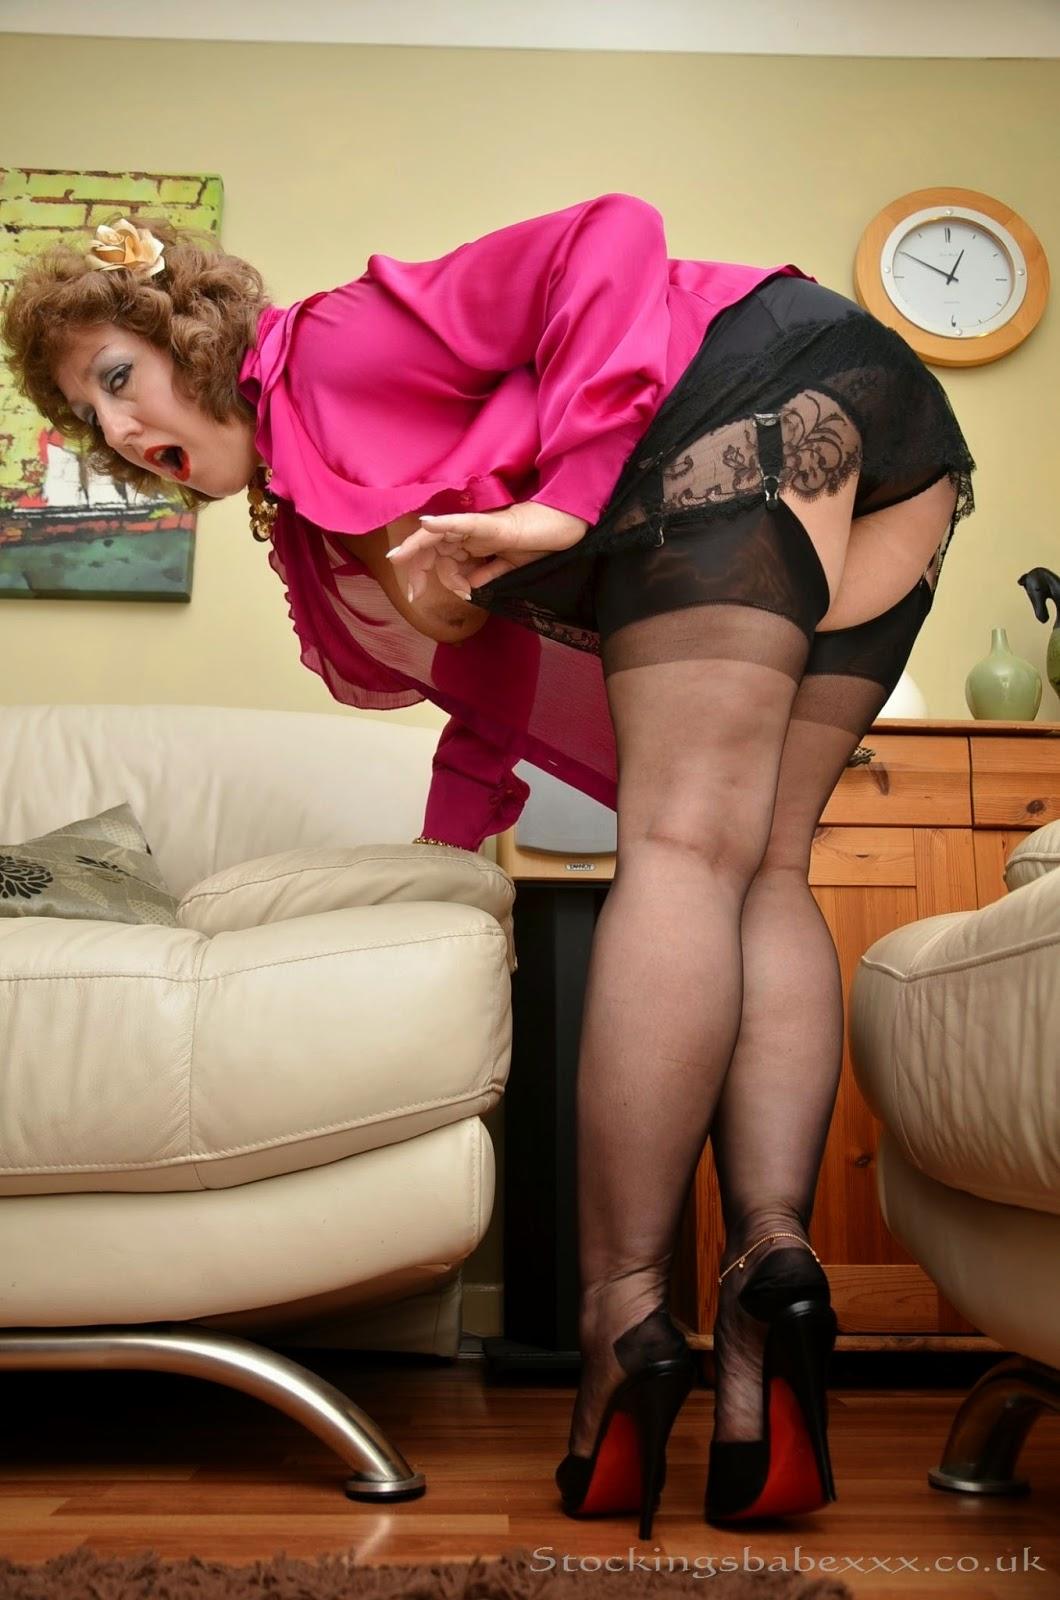 Julie skyhigh MONCLER fetish and fur & stockings